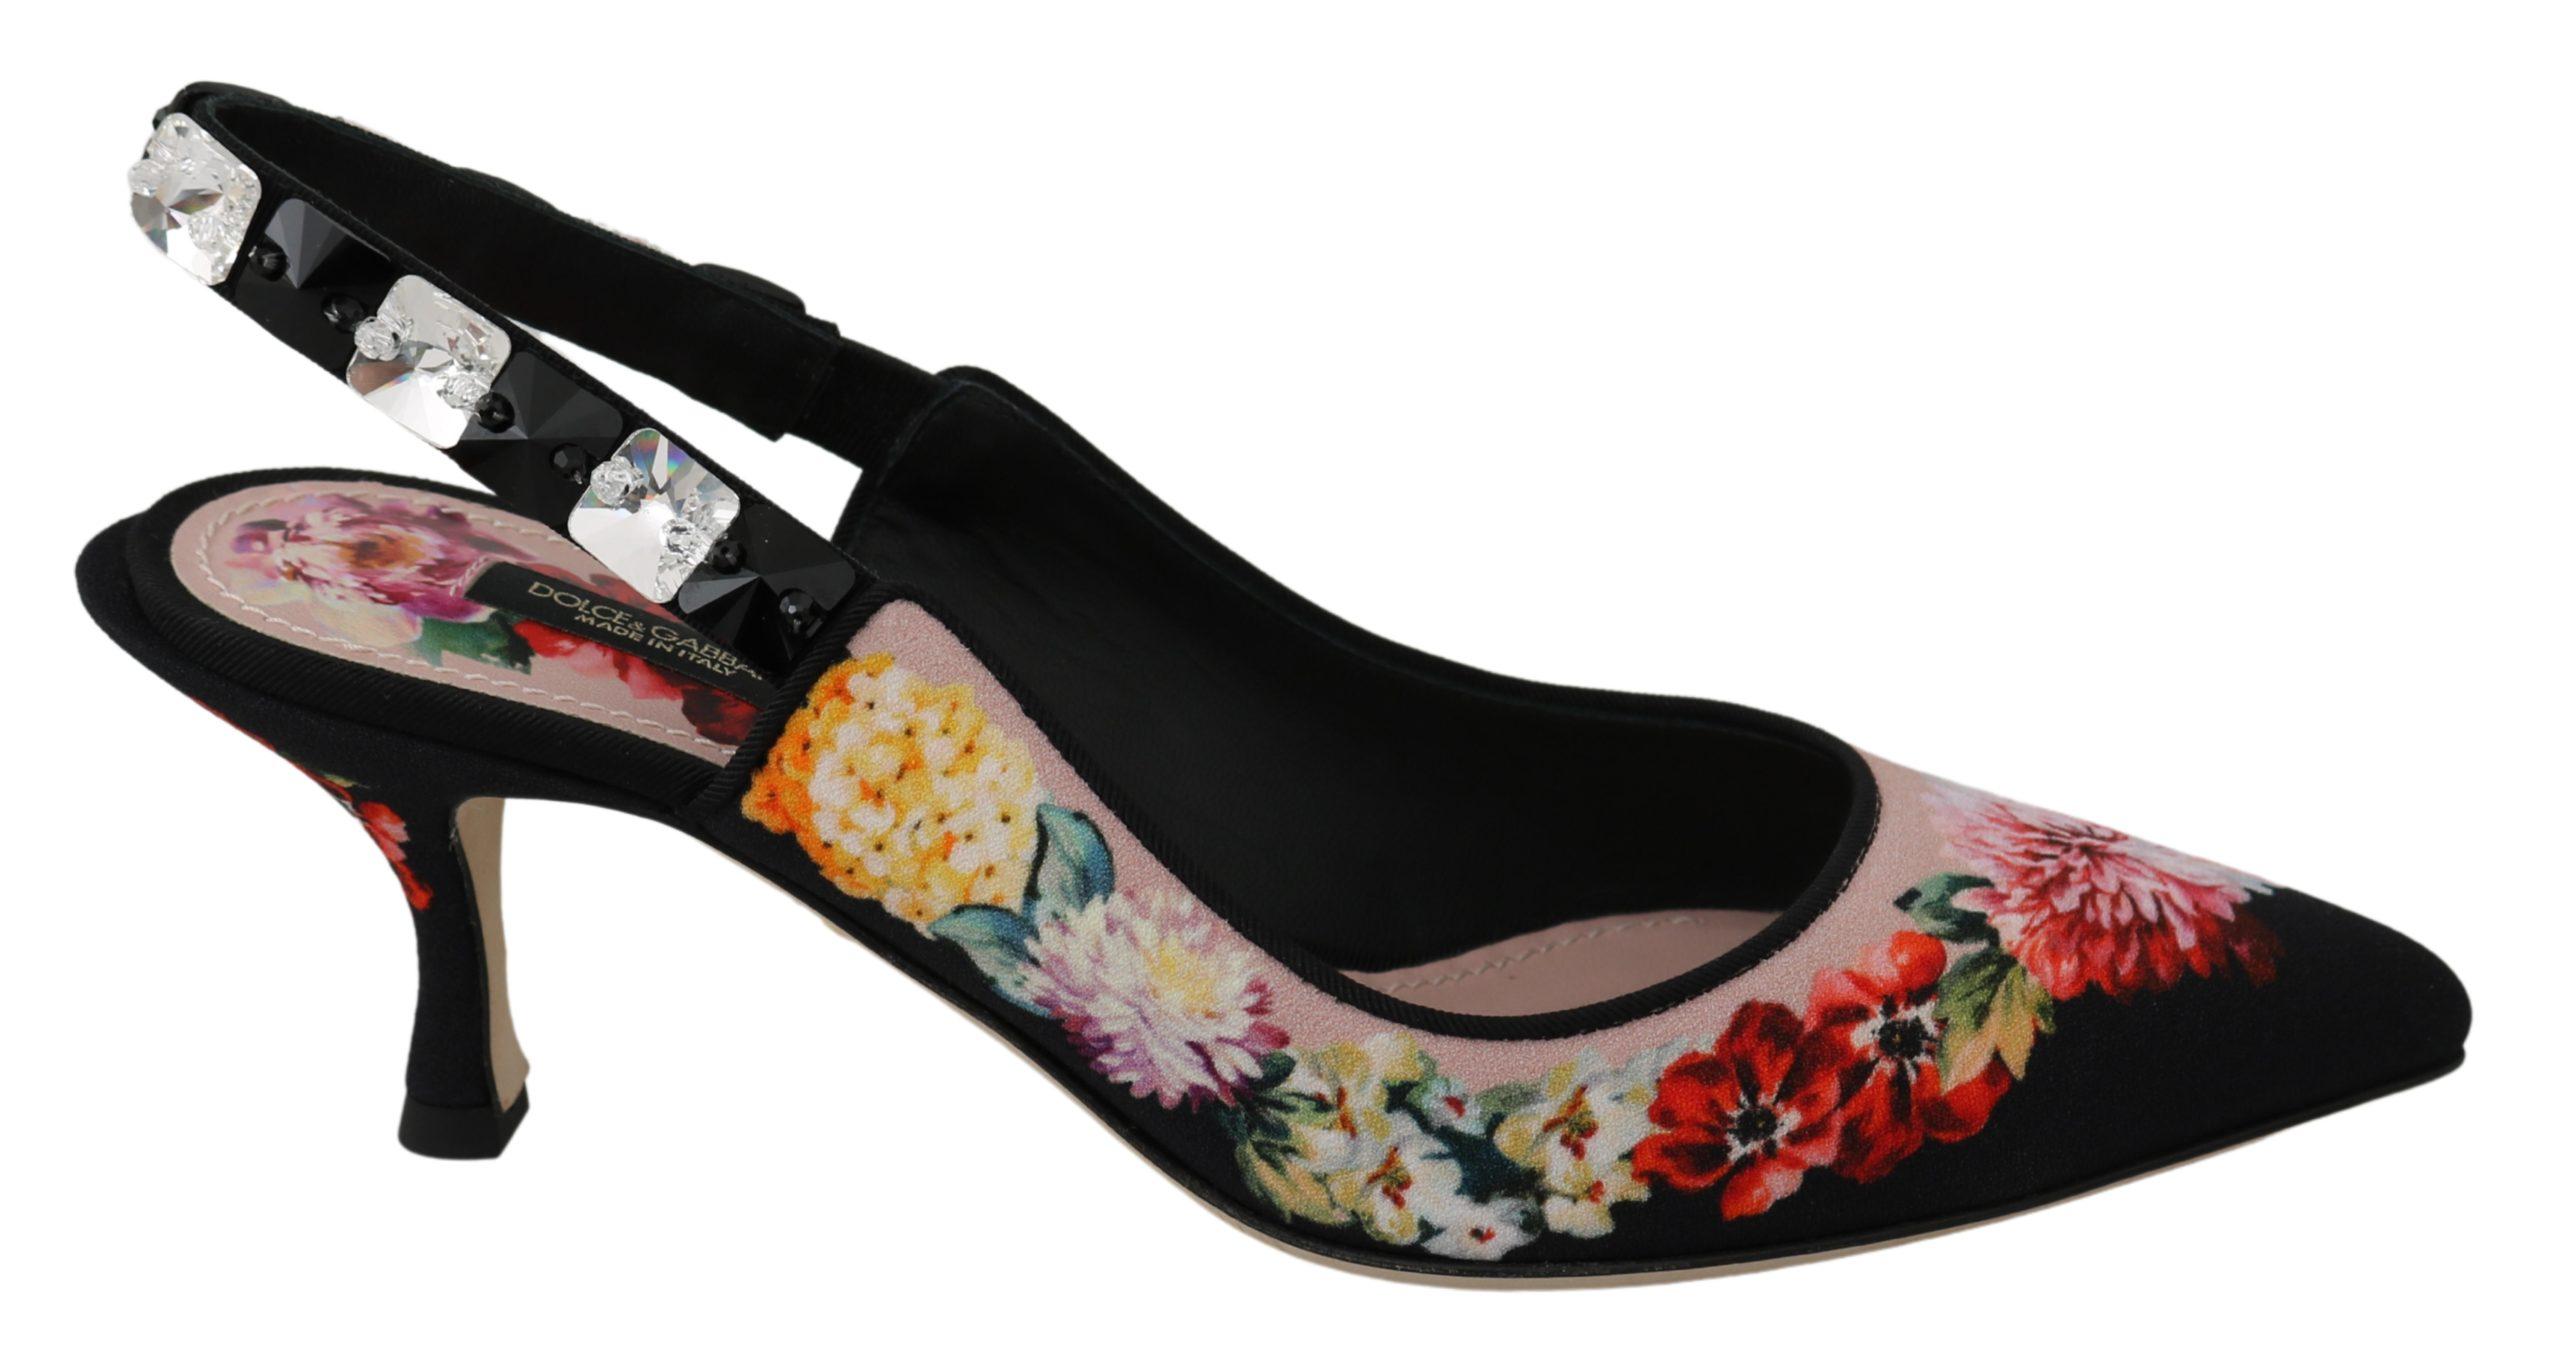 Dolce & Gabbana Women's Floral Crystal Heels Shoes Black LA6582 - EU35/US4.5